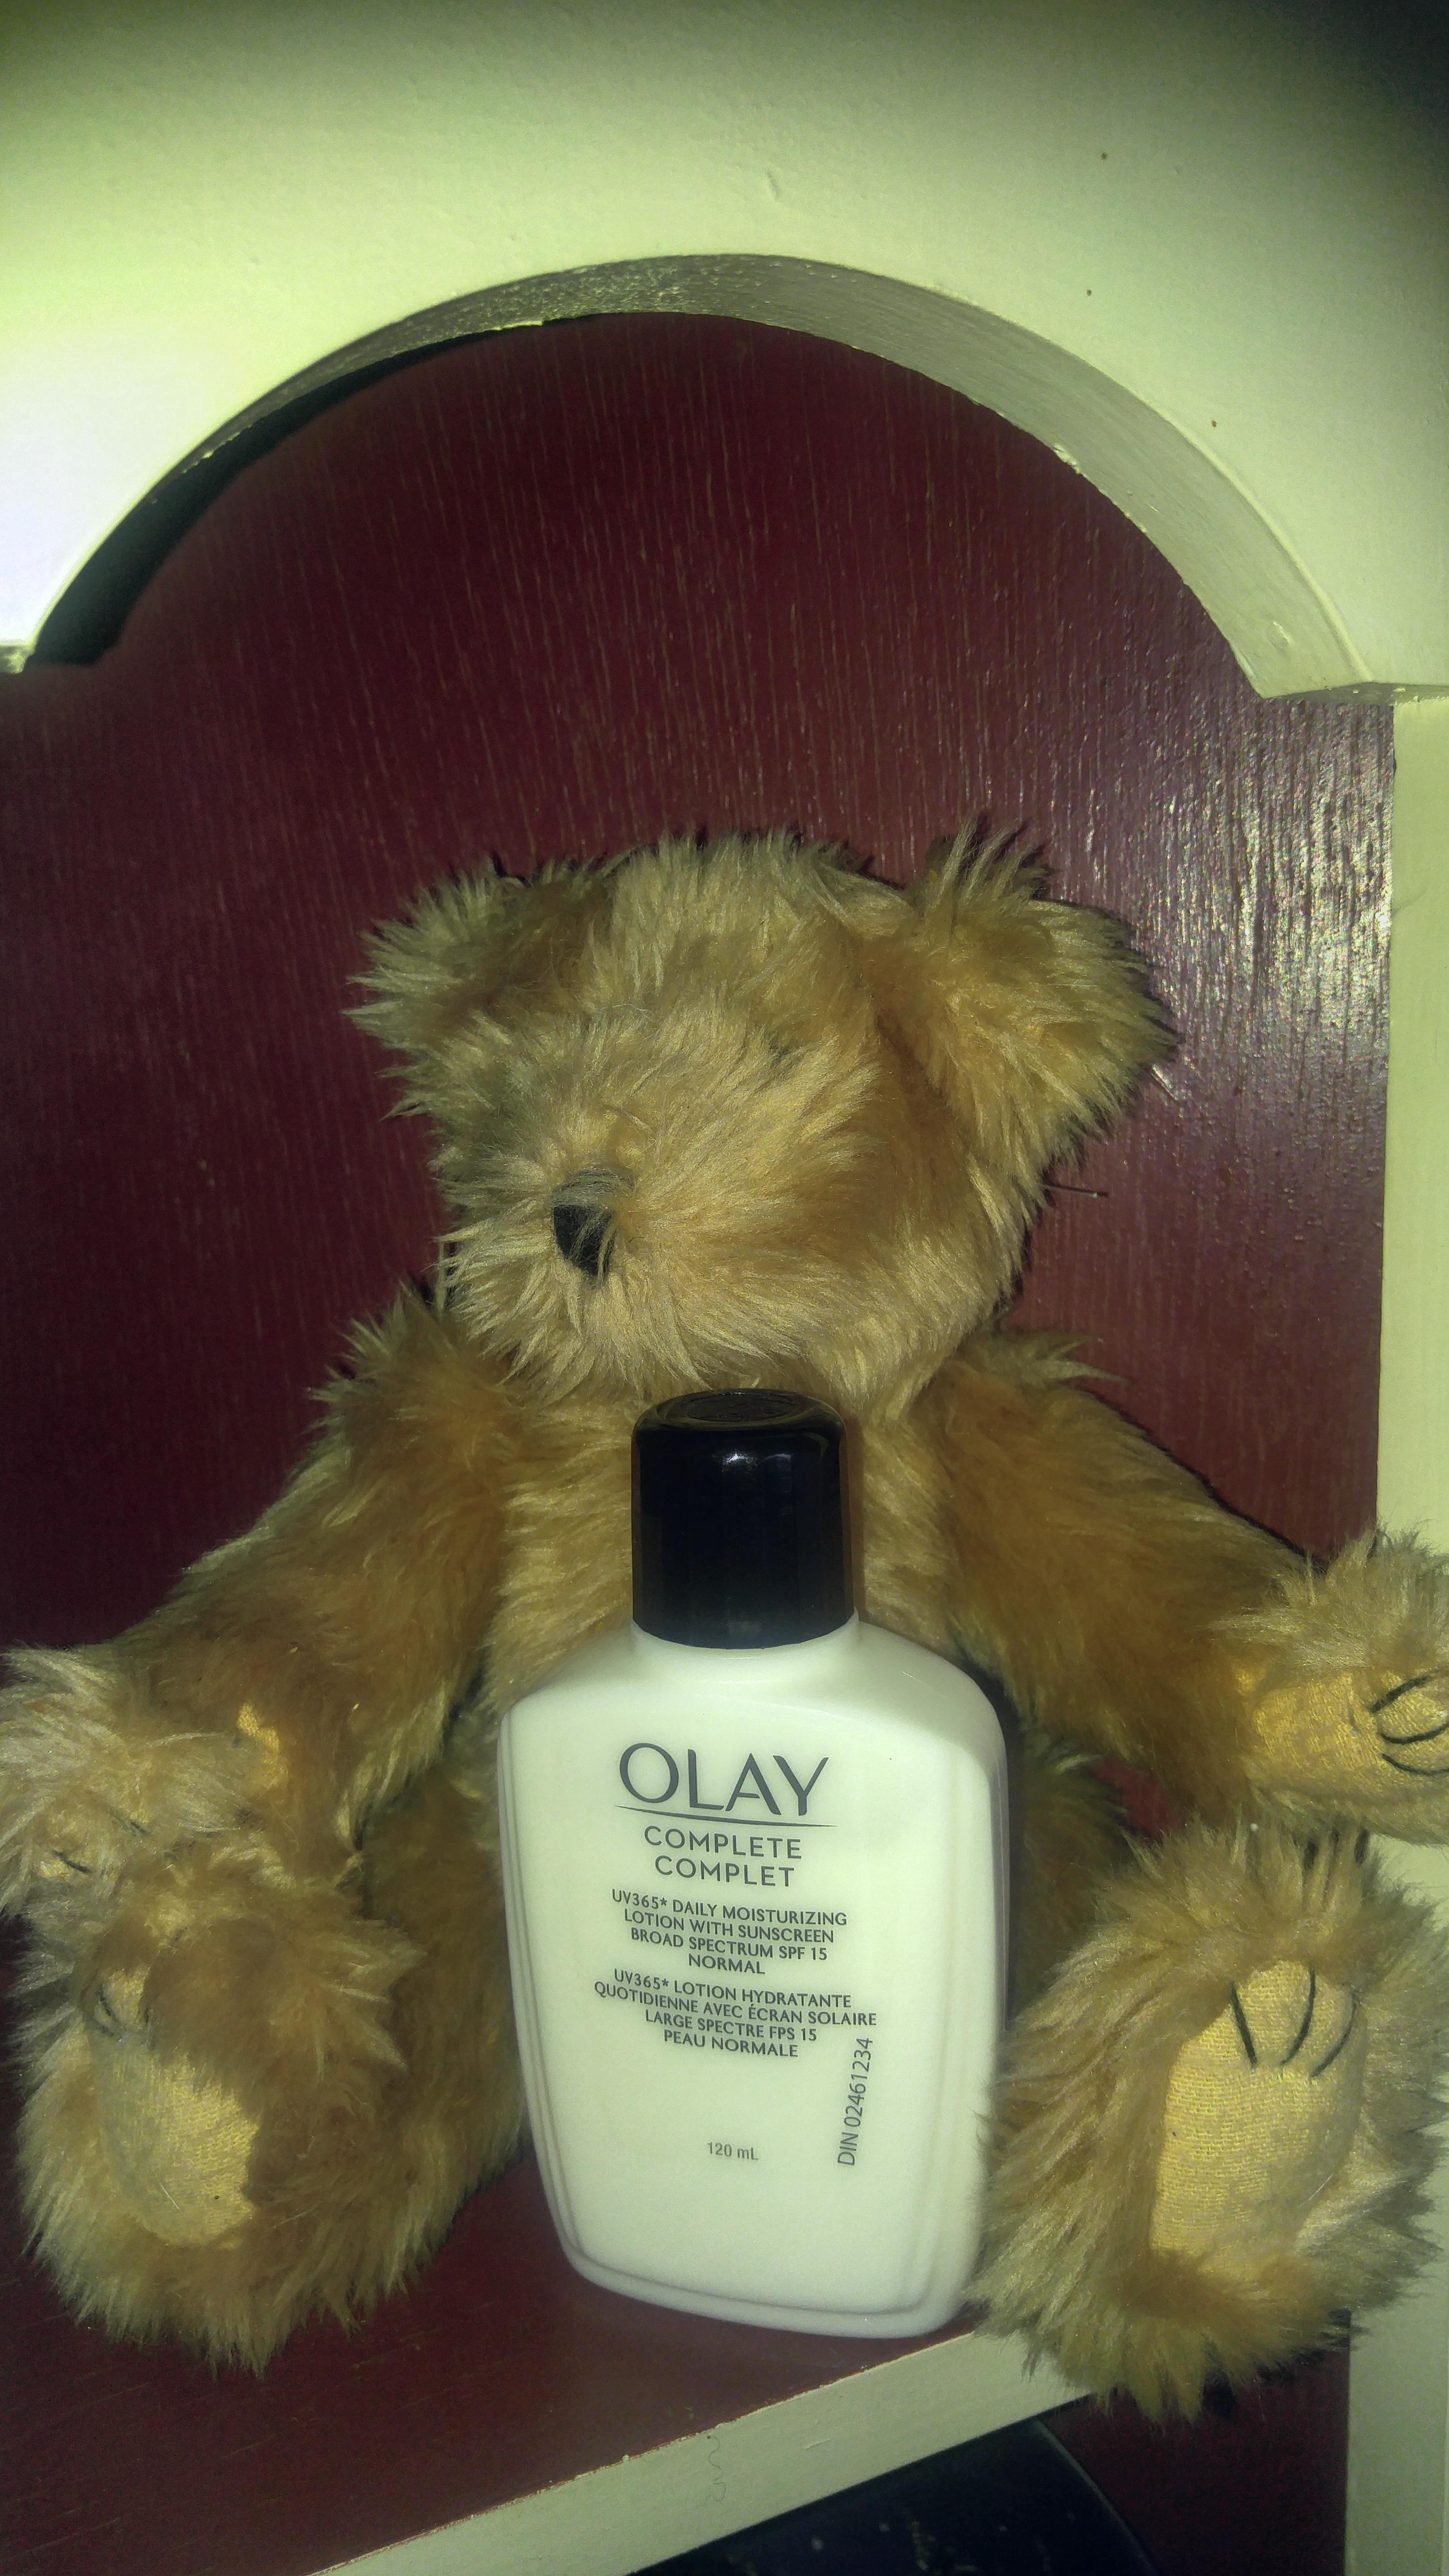 Oil of olay moisturizer reviews